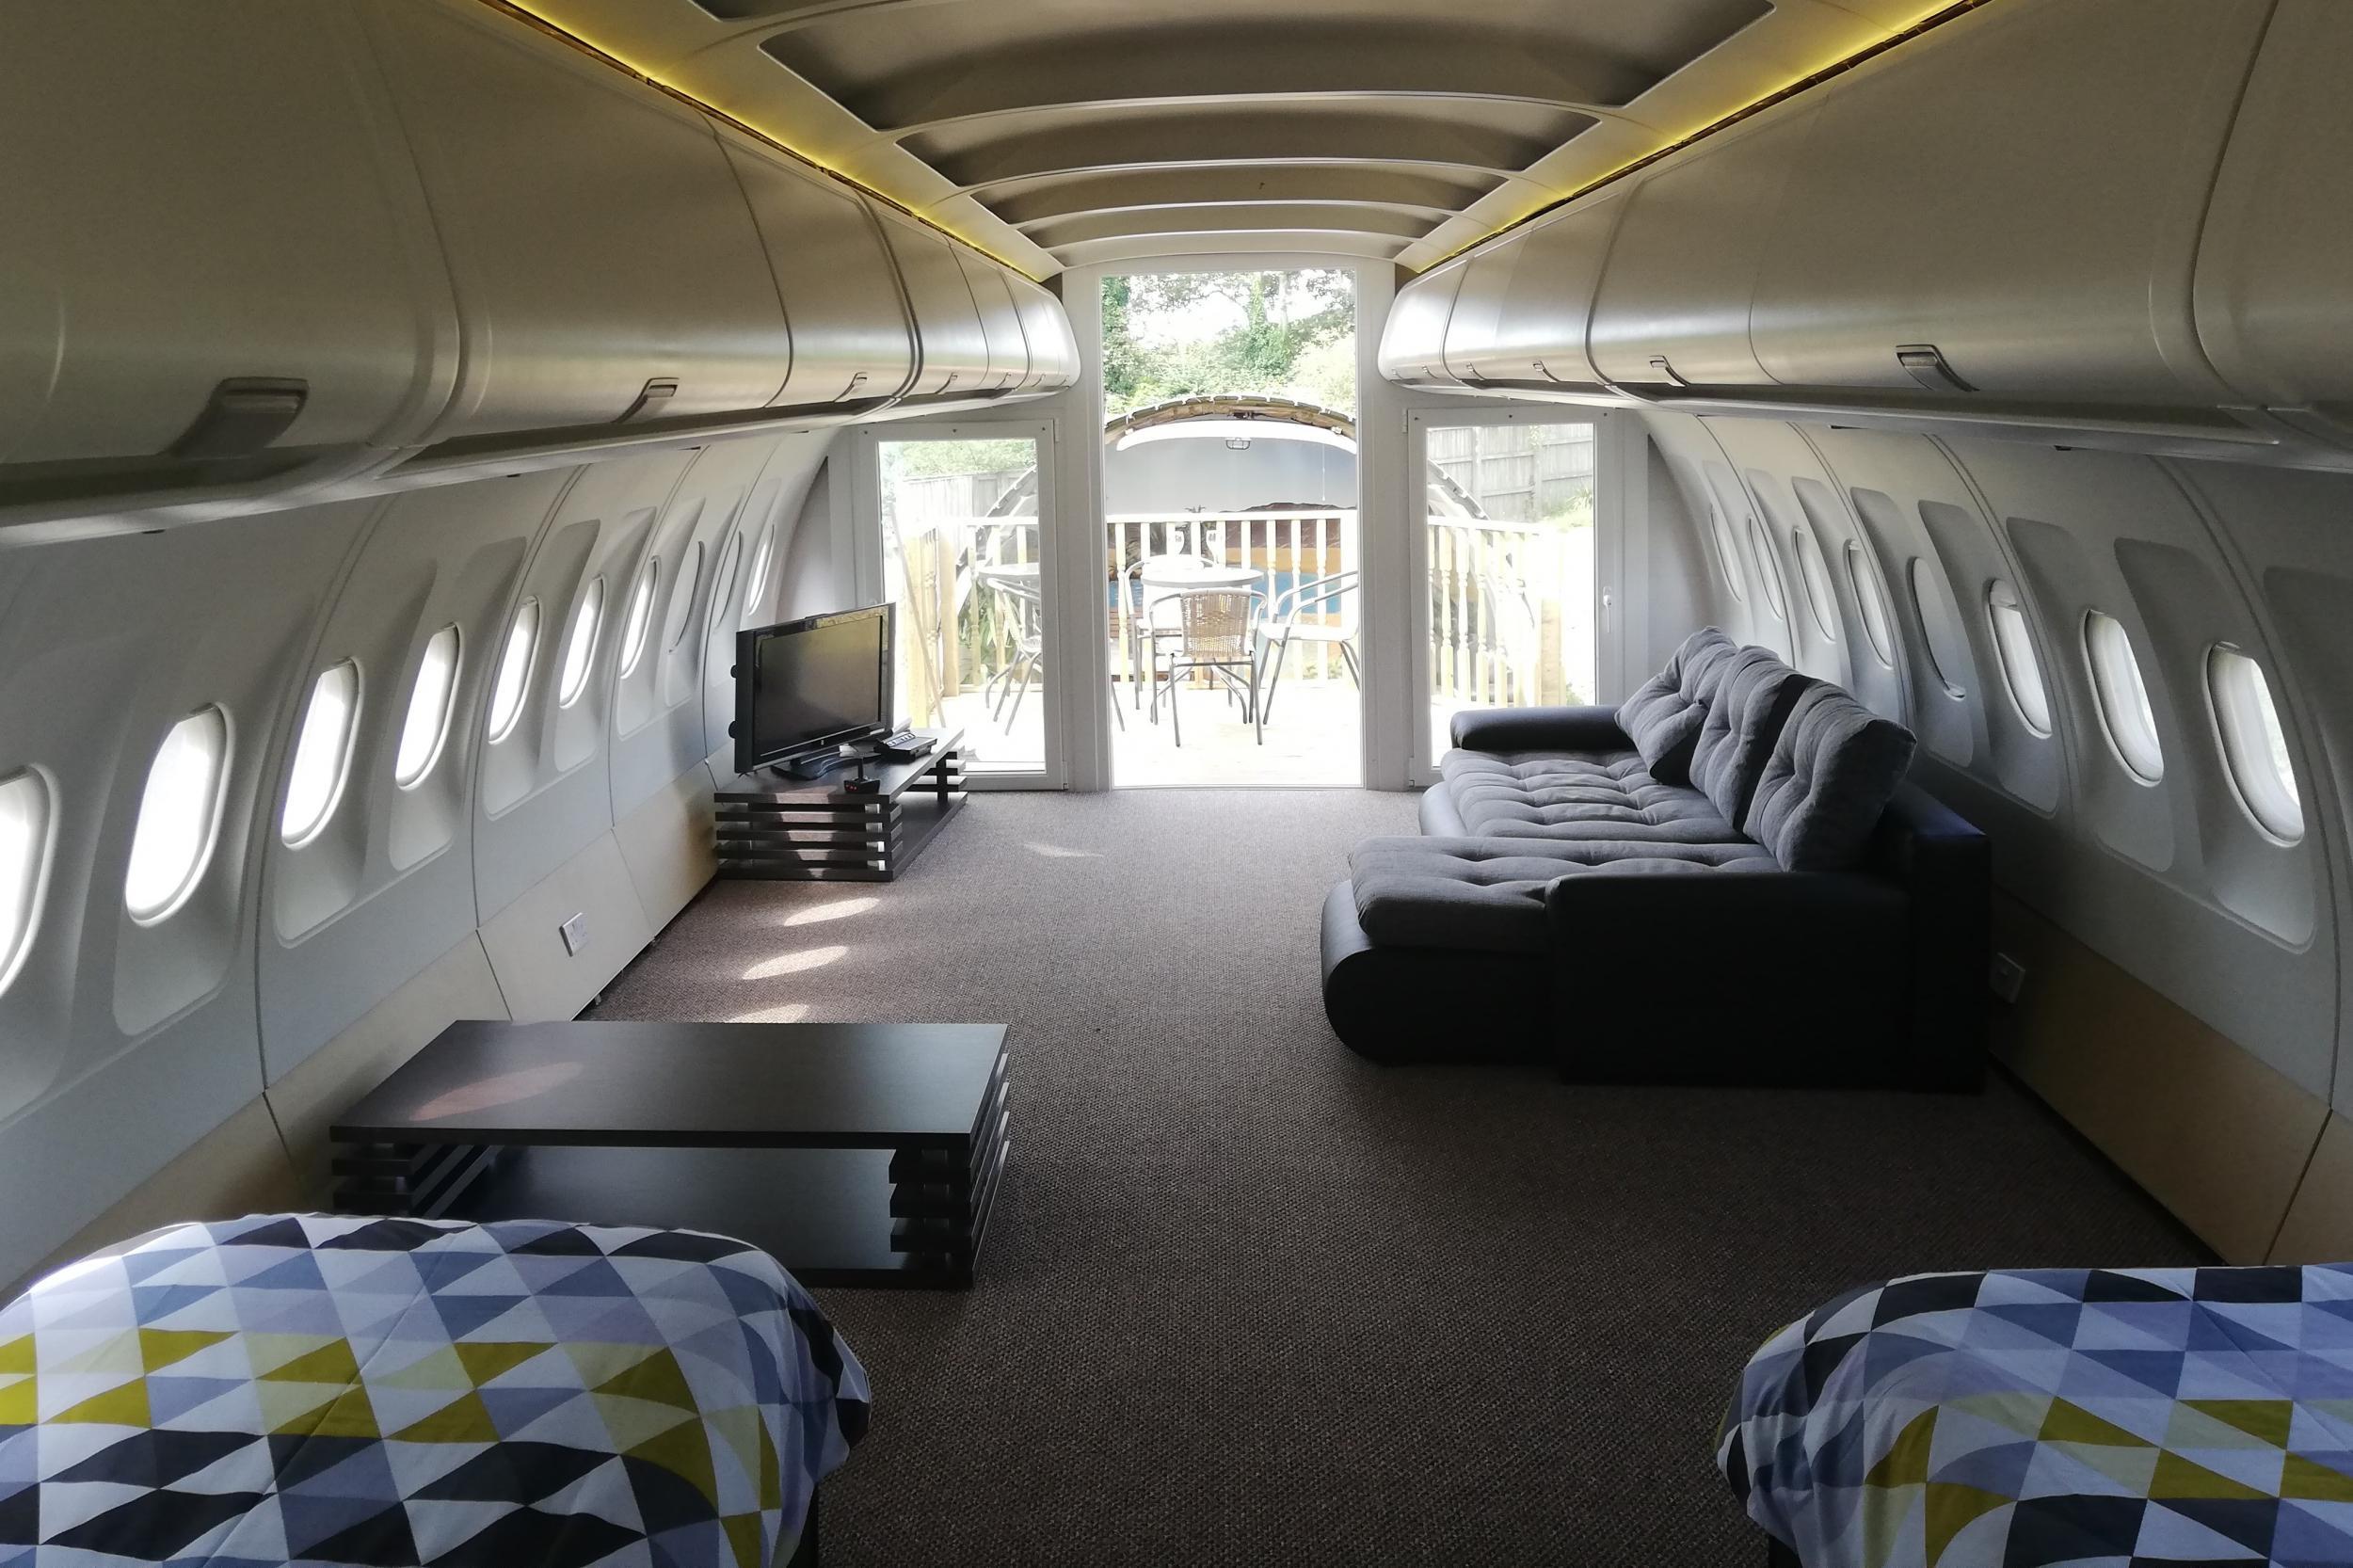 Etihad Airbus A319 vakantiehuisje